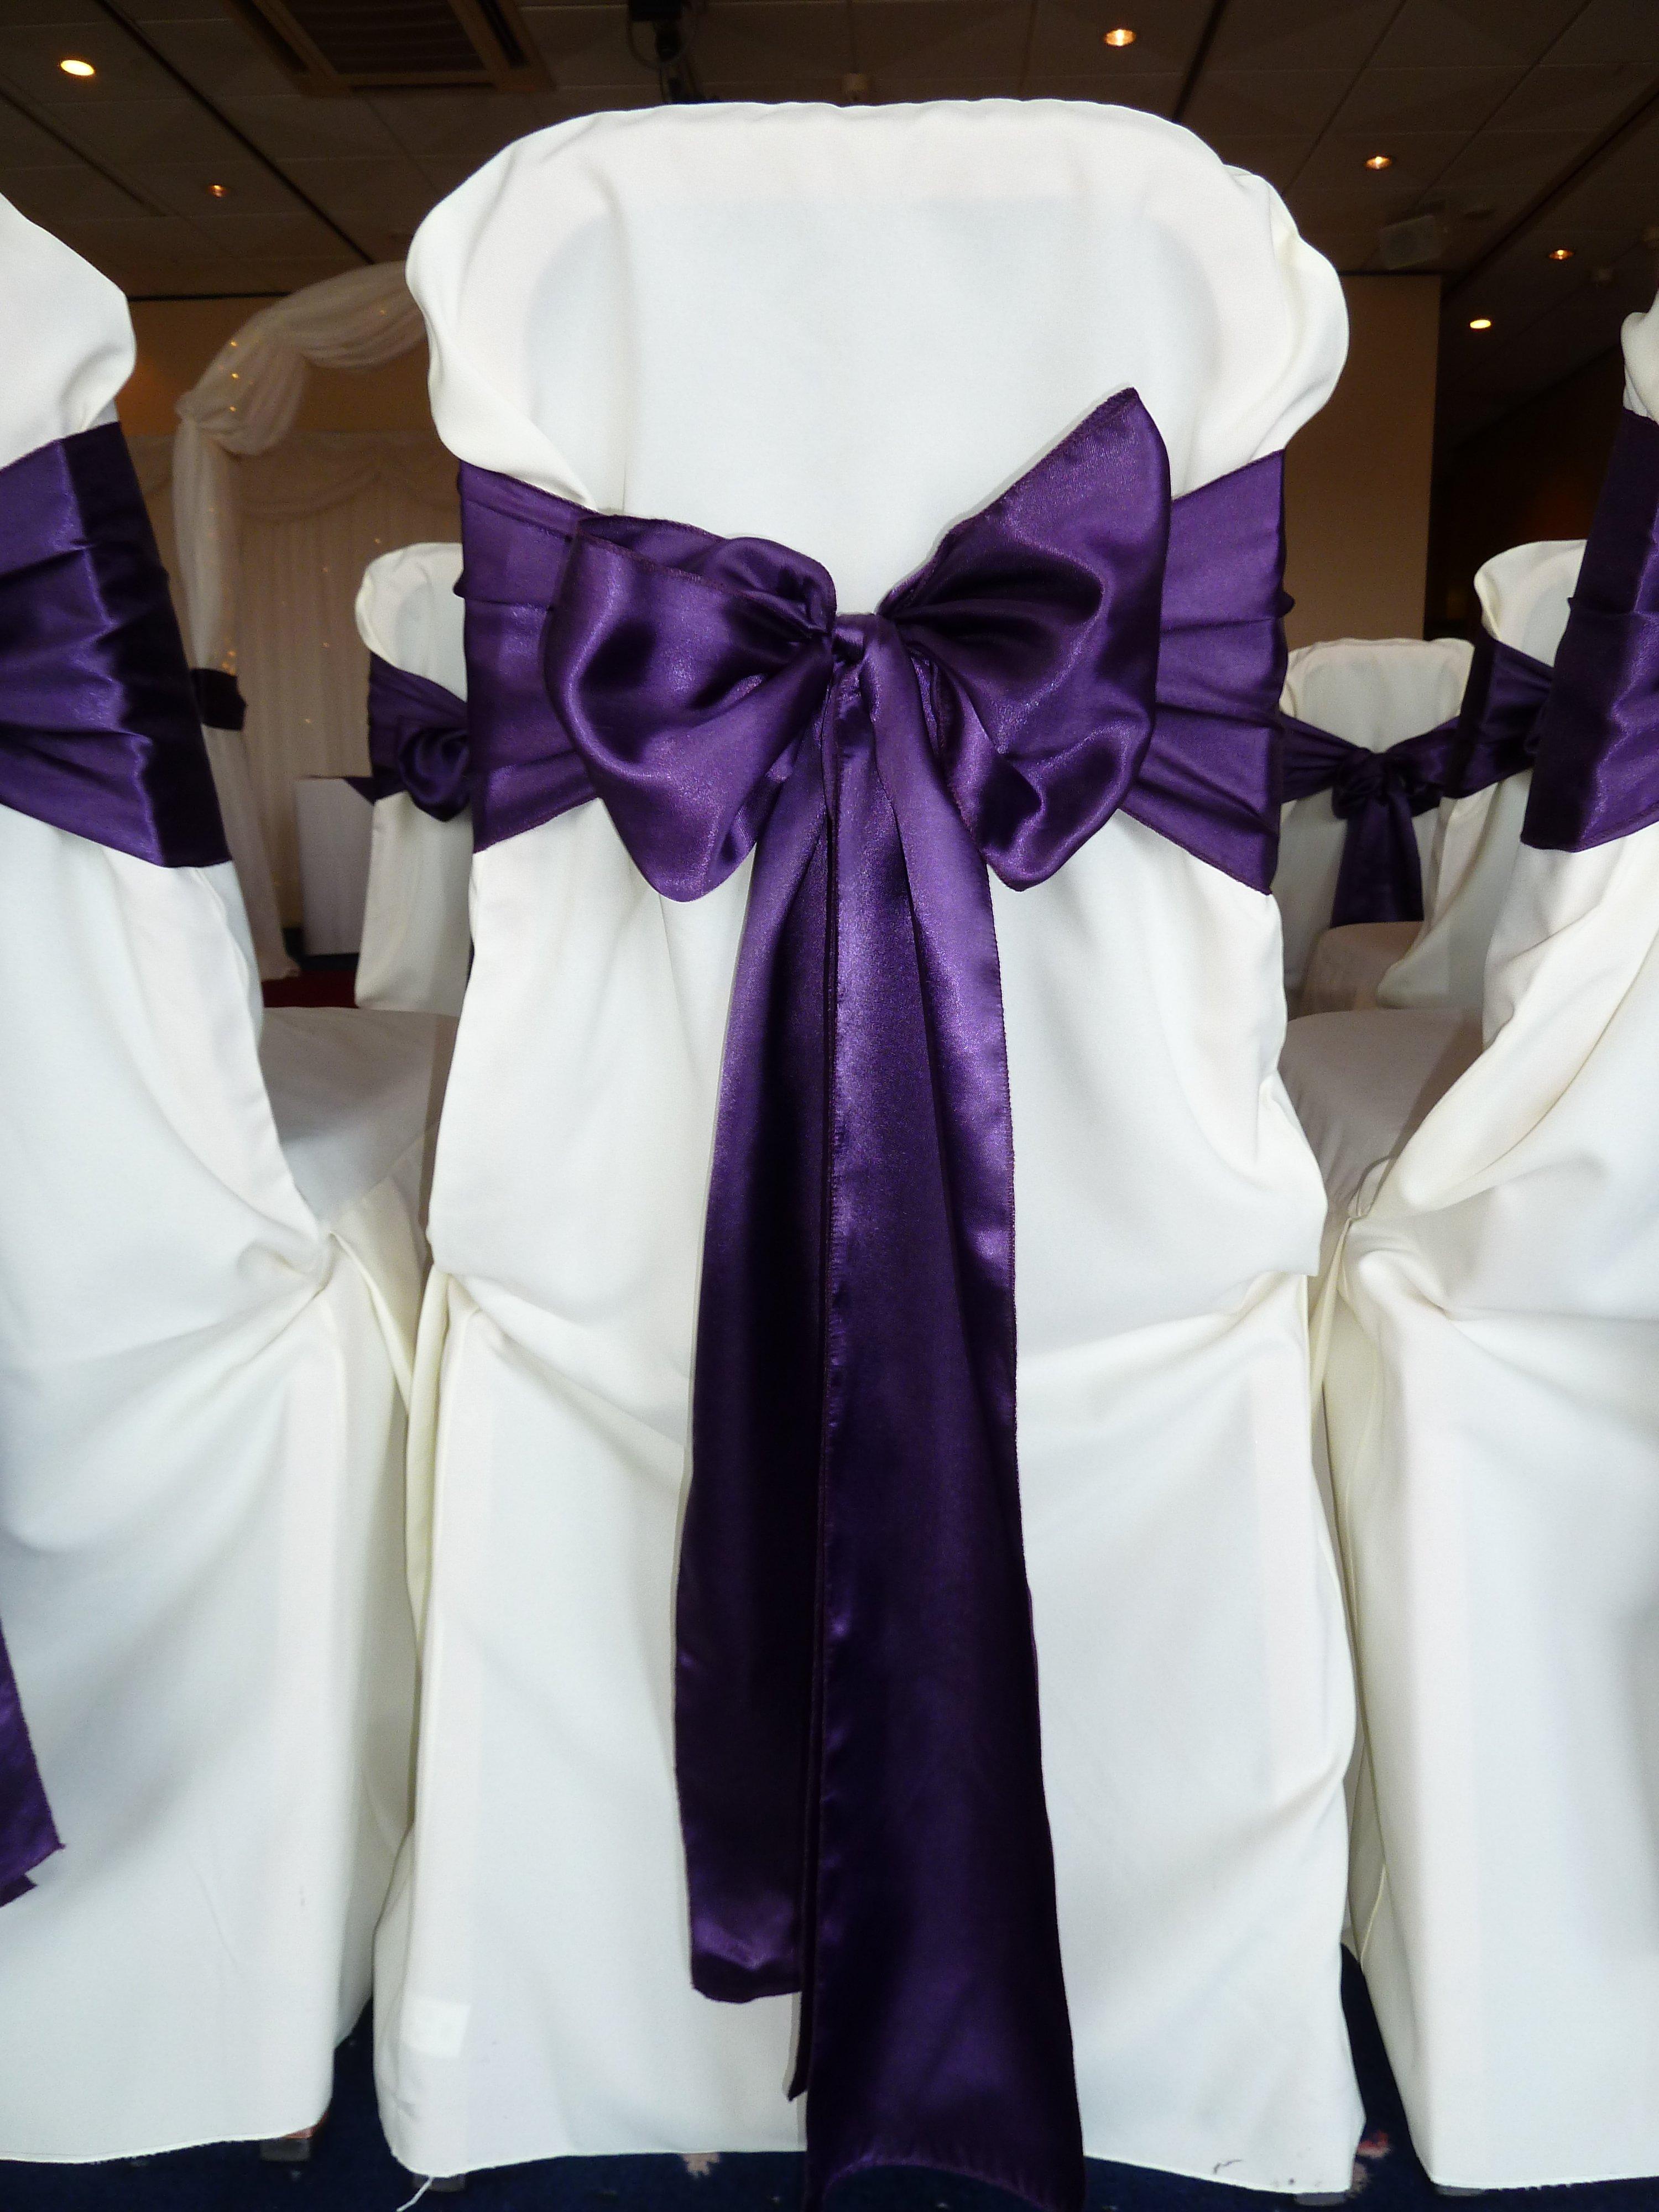 chair covers morecambe mac sports folding a cadbury purple themed wedding razzle dazzle